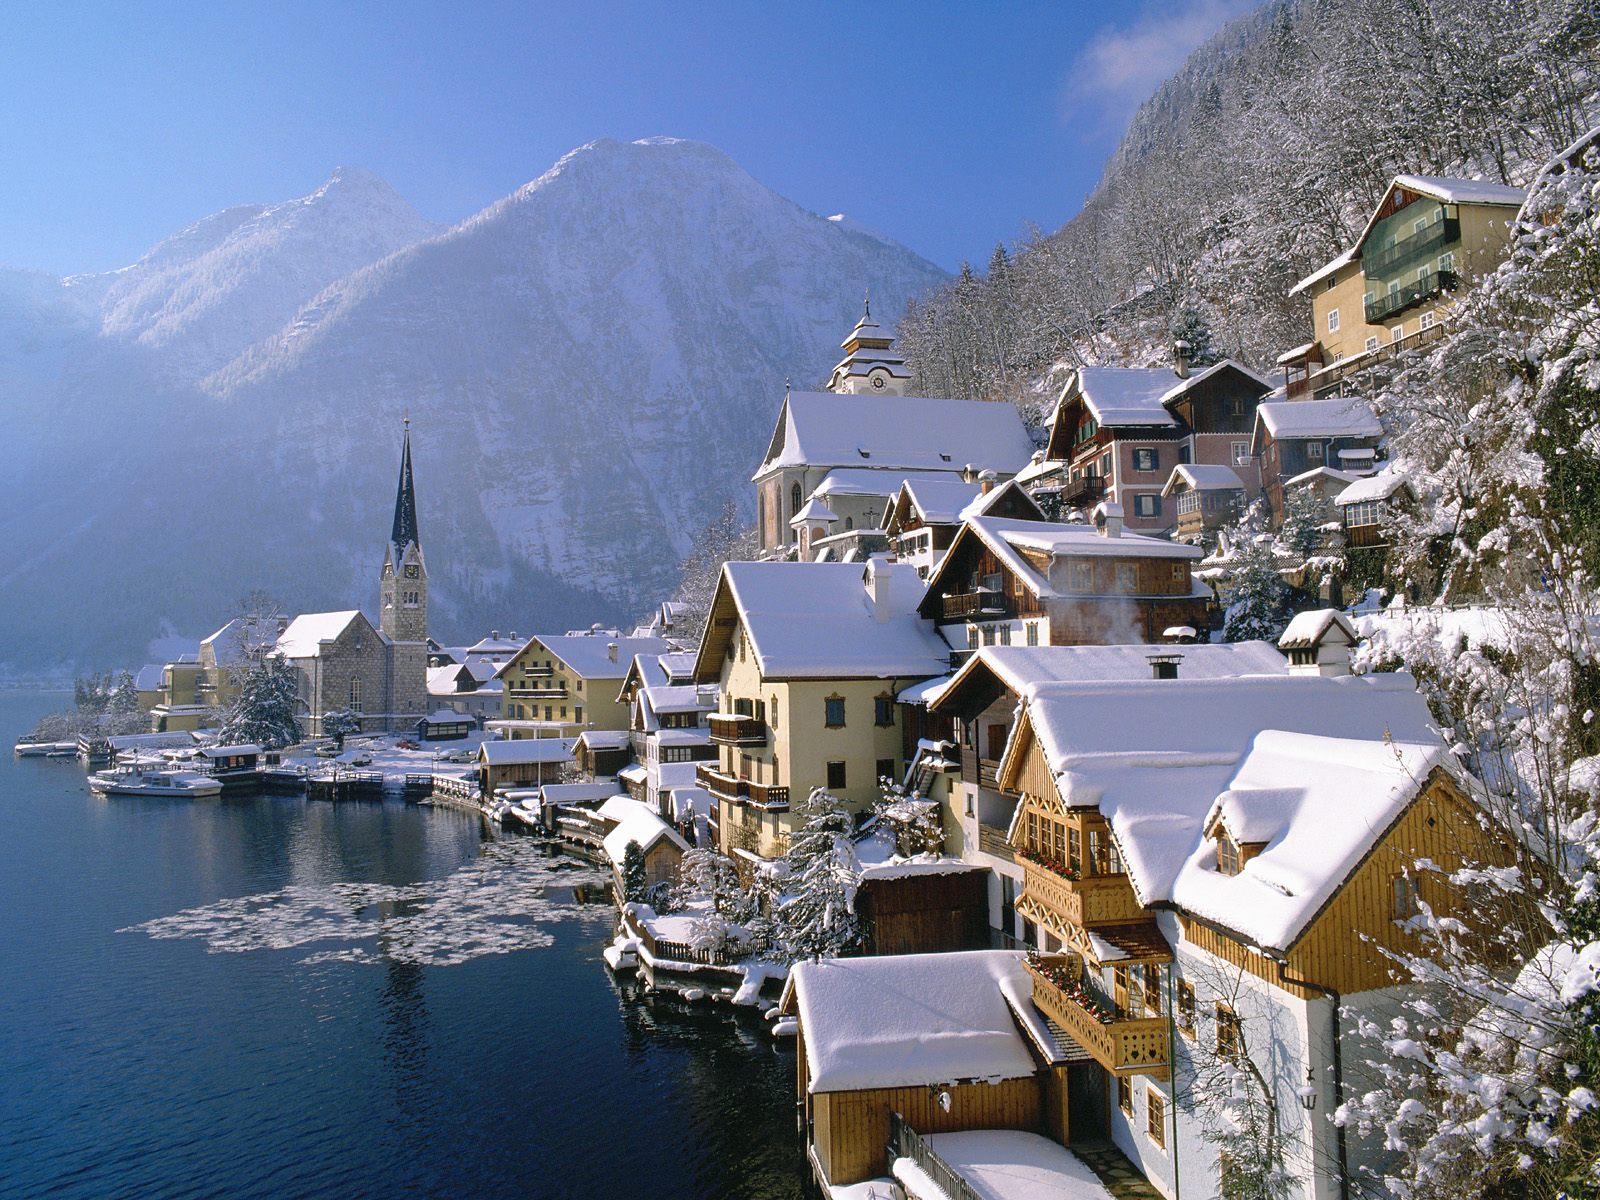 http://2.bp.blogspot.com/-x2k6vllZFdg/TonKcDX-cQI/AAAAAAAAAYs/lUhu_SRbNaw/s1600/Hallstatt+in+Winter%252C+Austria.jpg